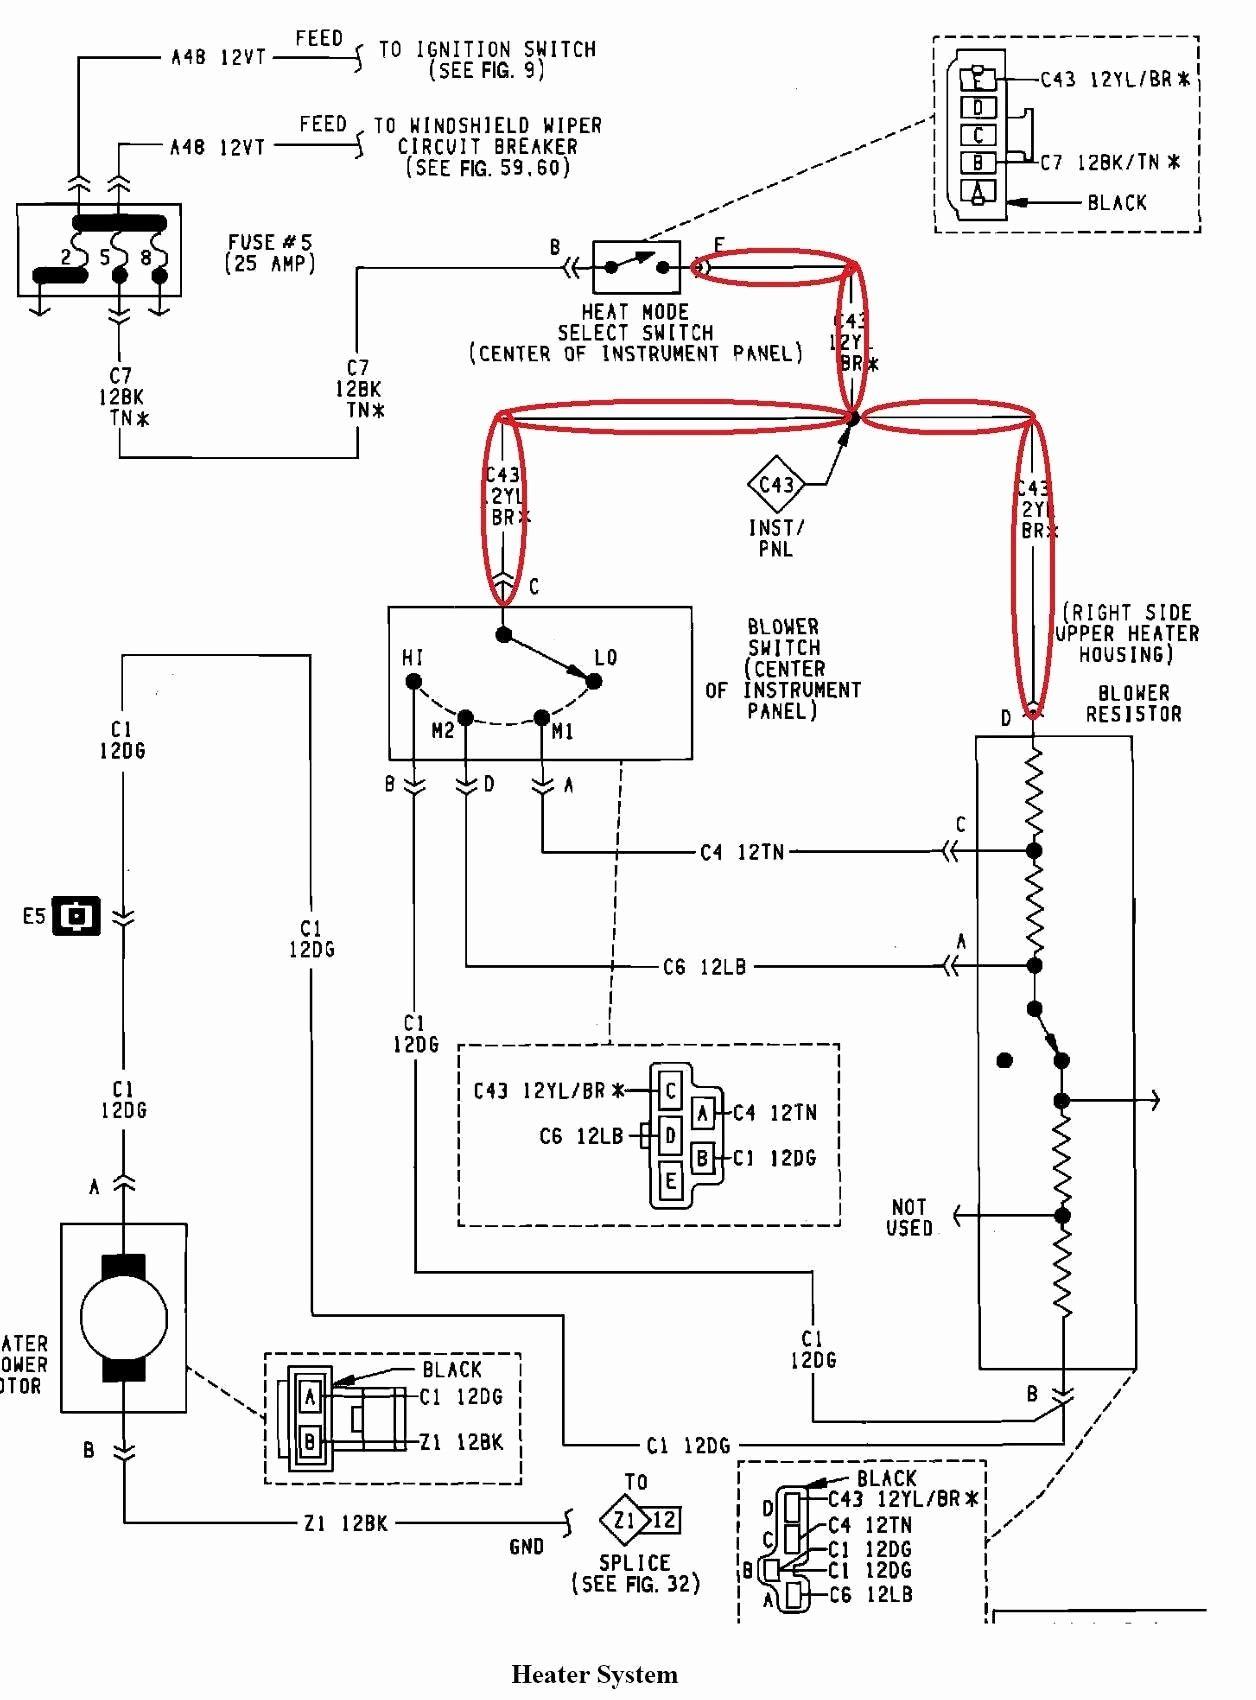 48 Volt Golf Cart Wiring Diagram : wiring, diagram, Headlight, Wiring, Diagram, #diagram, #diagramsample, #diagramtemplate, #wiringdiagram, #diagramchart, #works…, Cart,, Carts,